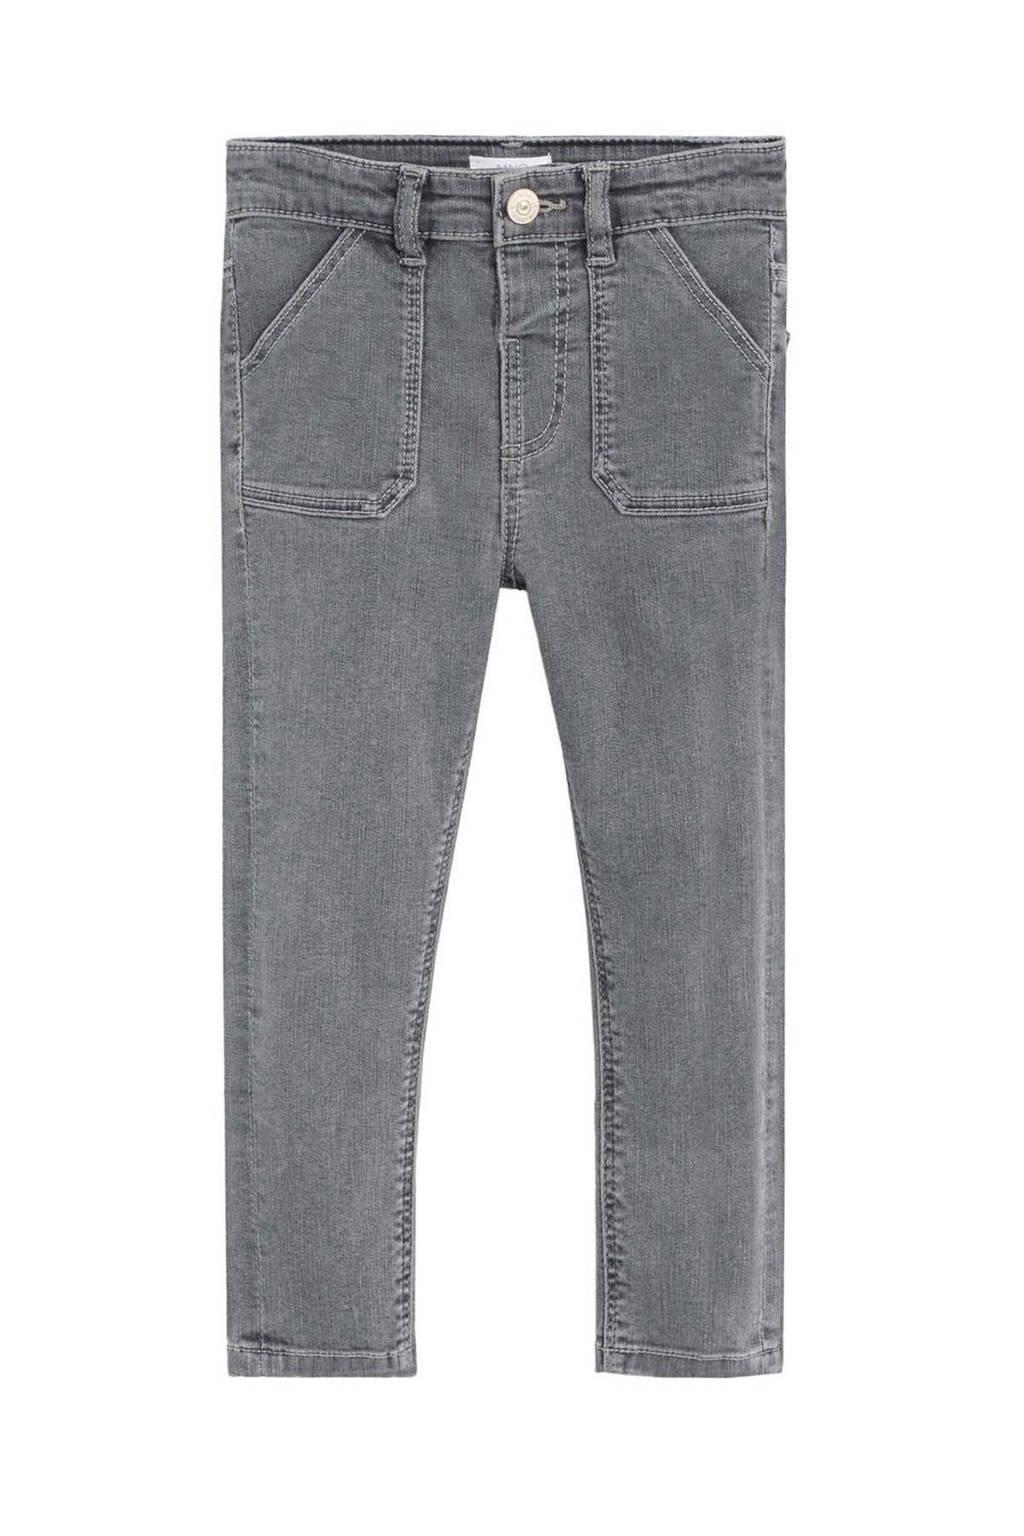 Mango Kids straight fit jeans grijs, Grijs